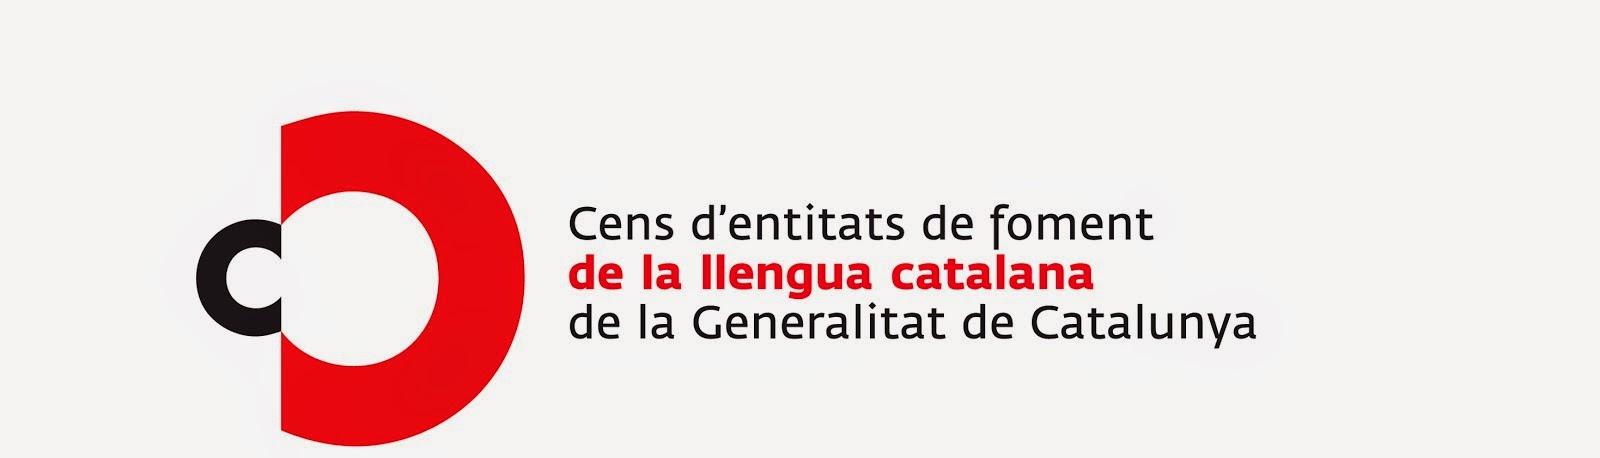 Cens llengua catalana